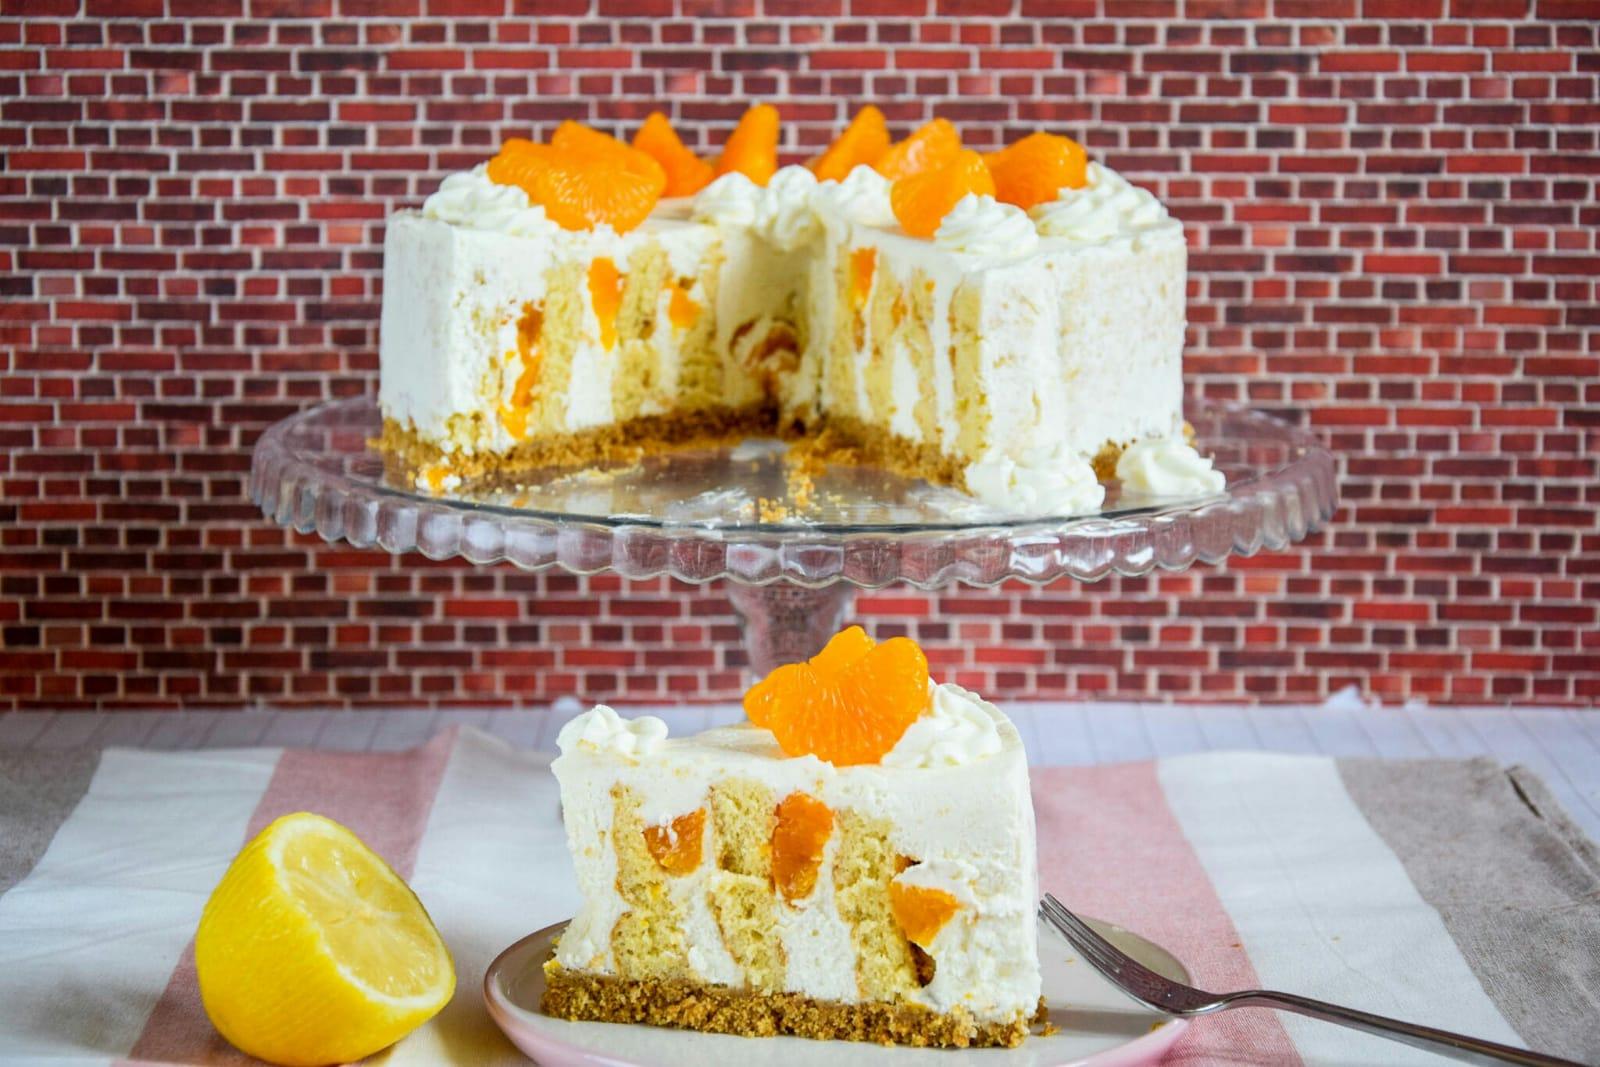 Kiras Bakery Kase Sahne Wickeltorte Klassische Kase Sahne Torte